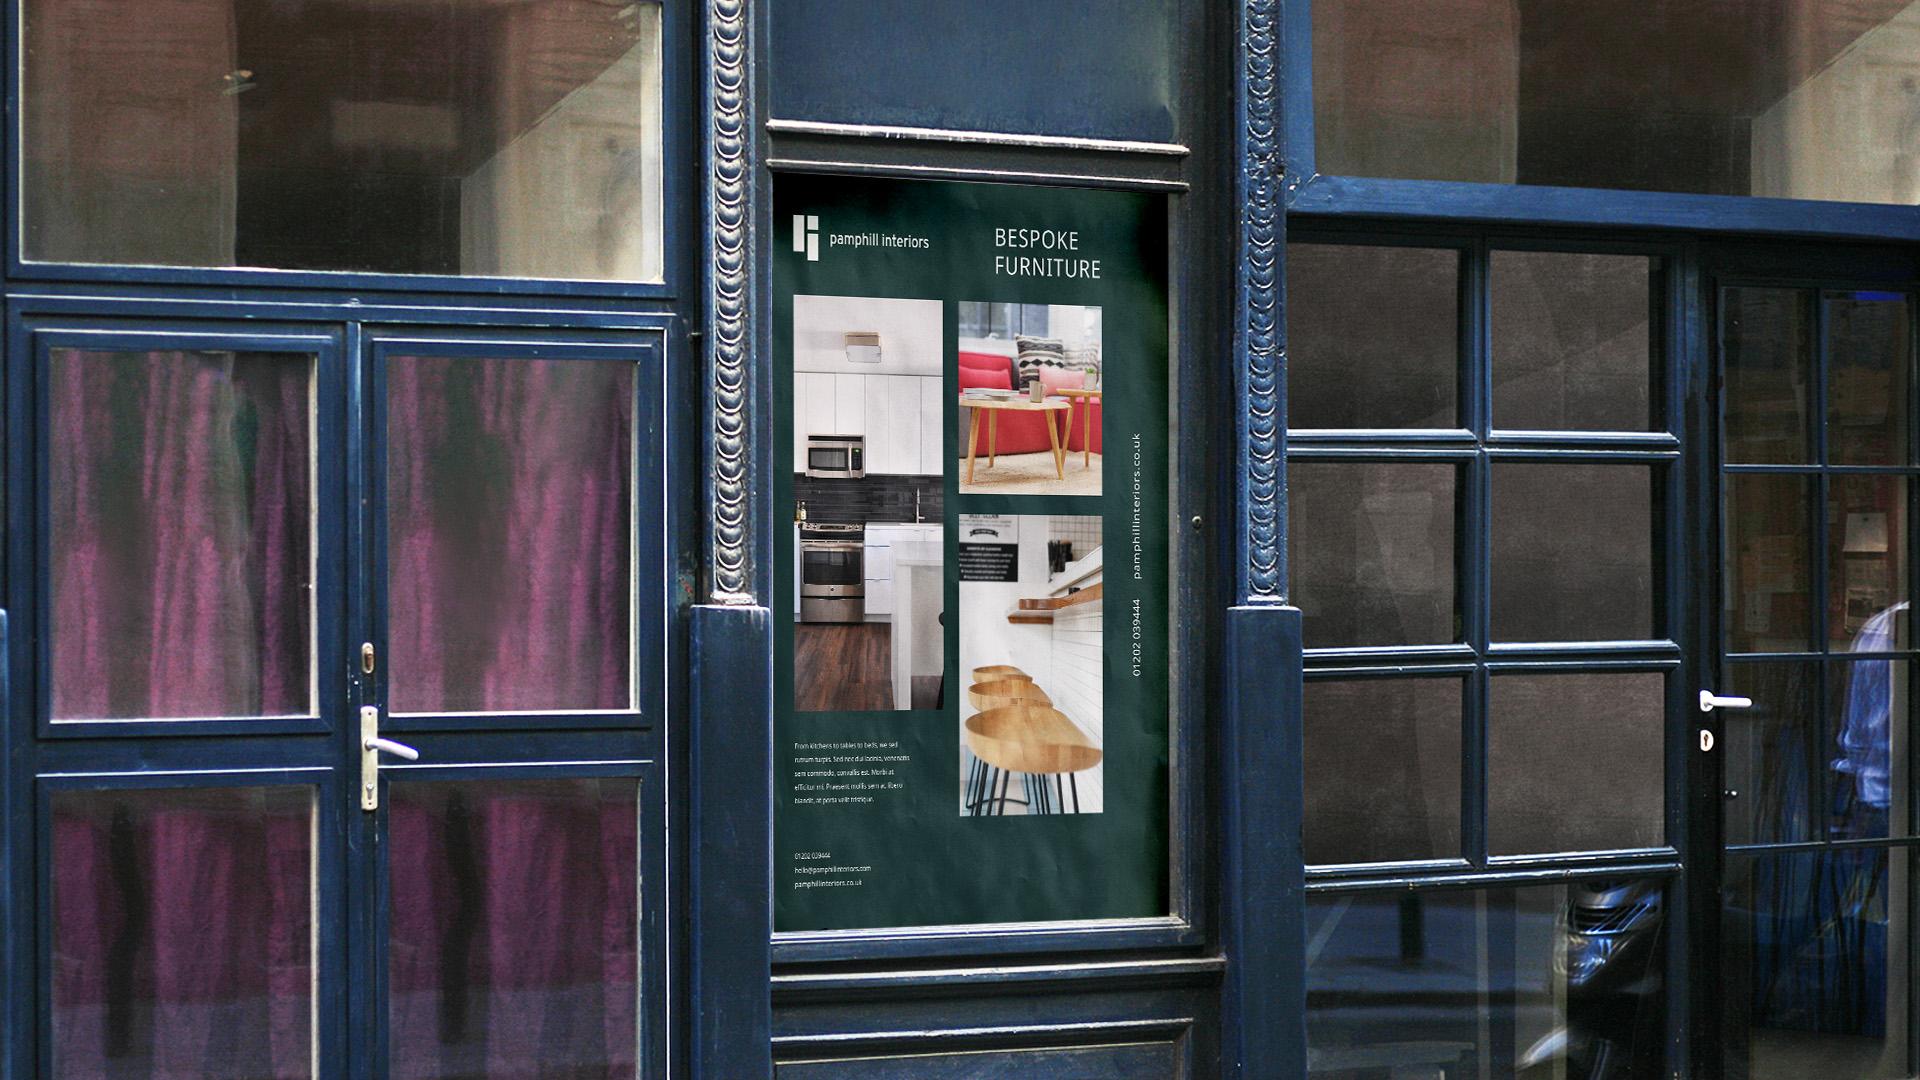 07-Lobo-Creative-Pamphill-Interiors-branding-logo-design-case-study.jpg